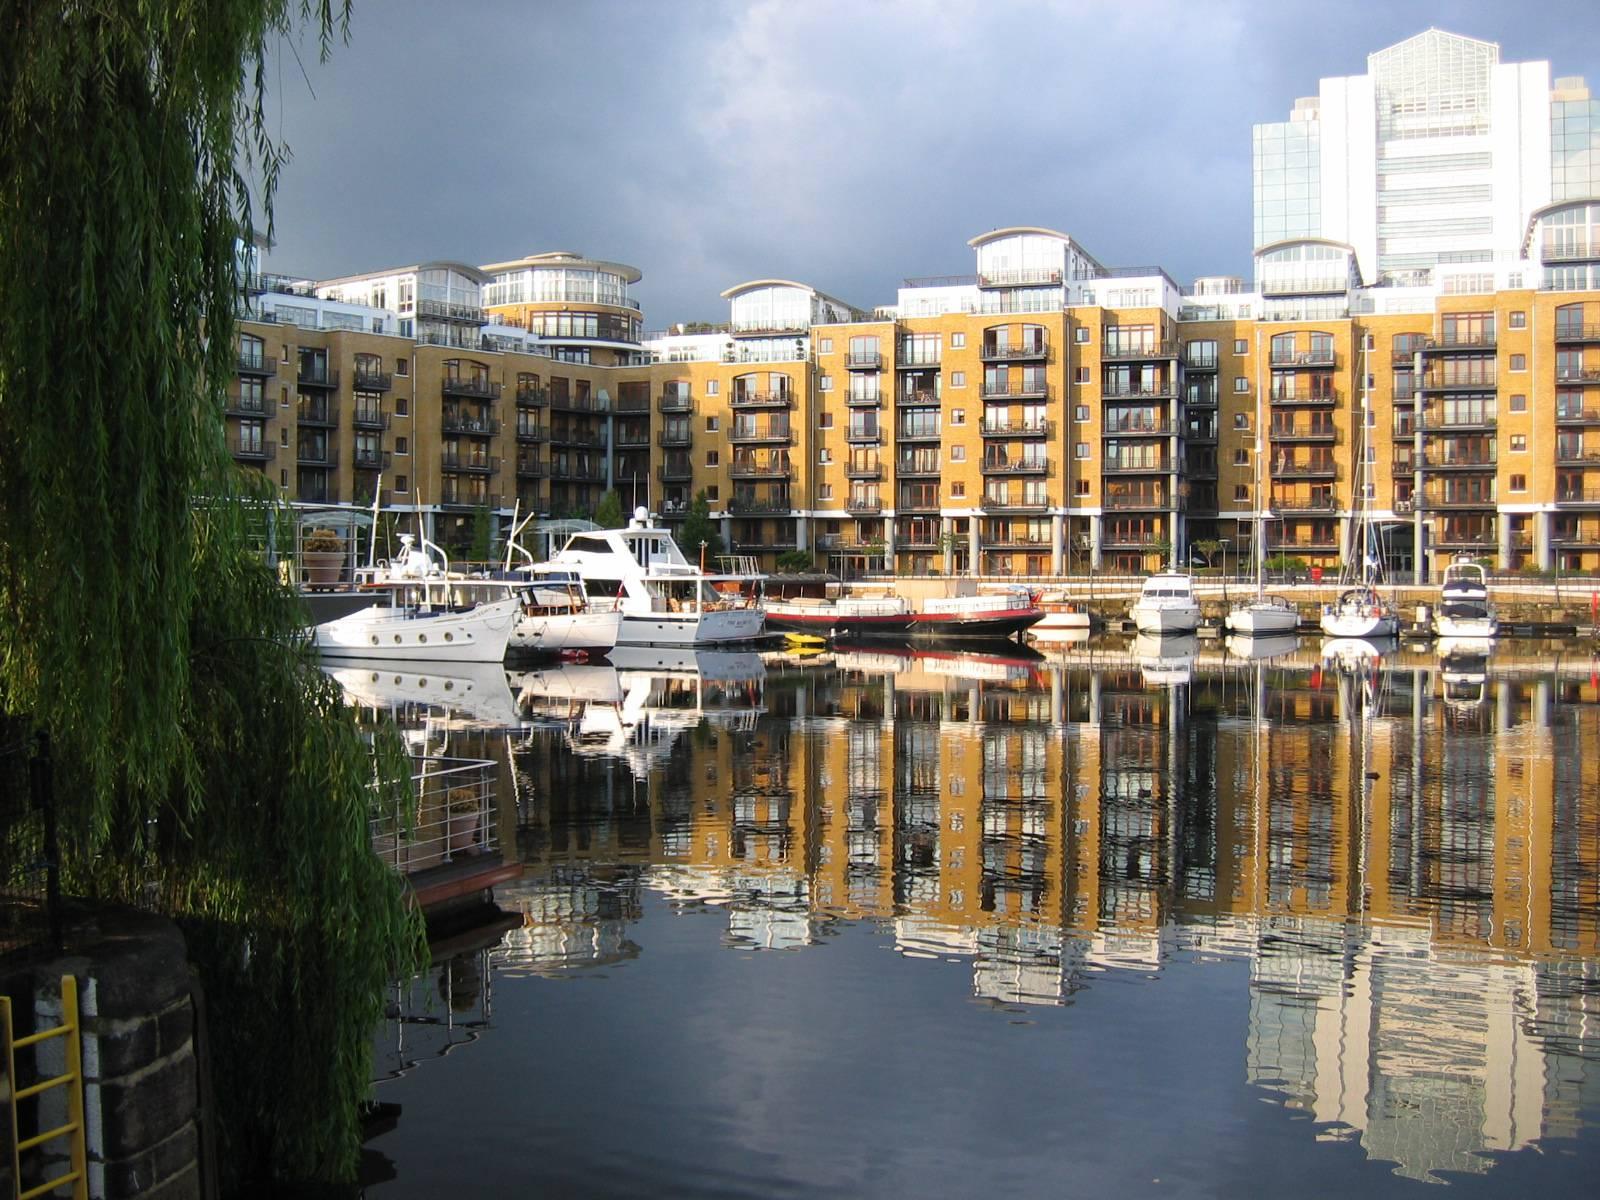 St_Katarine's_Docks